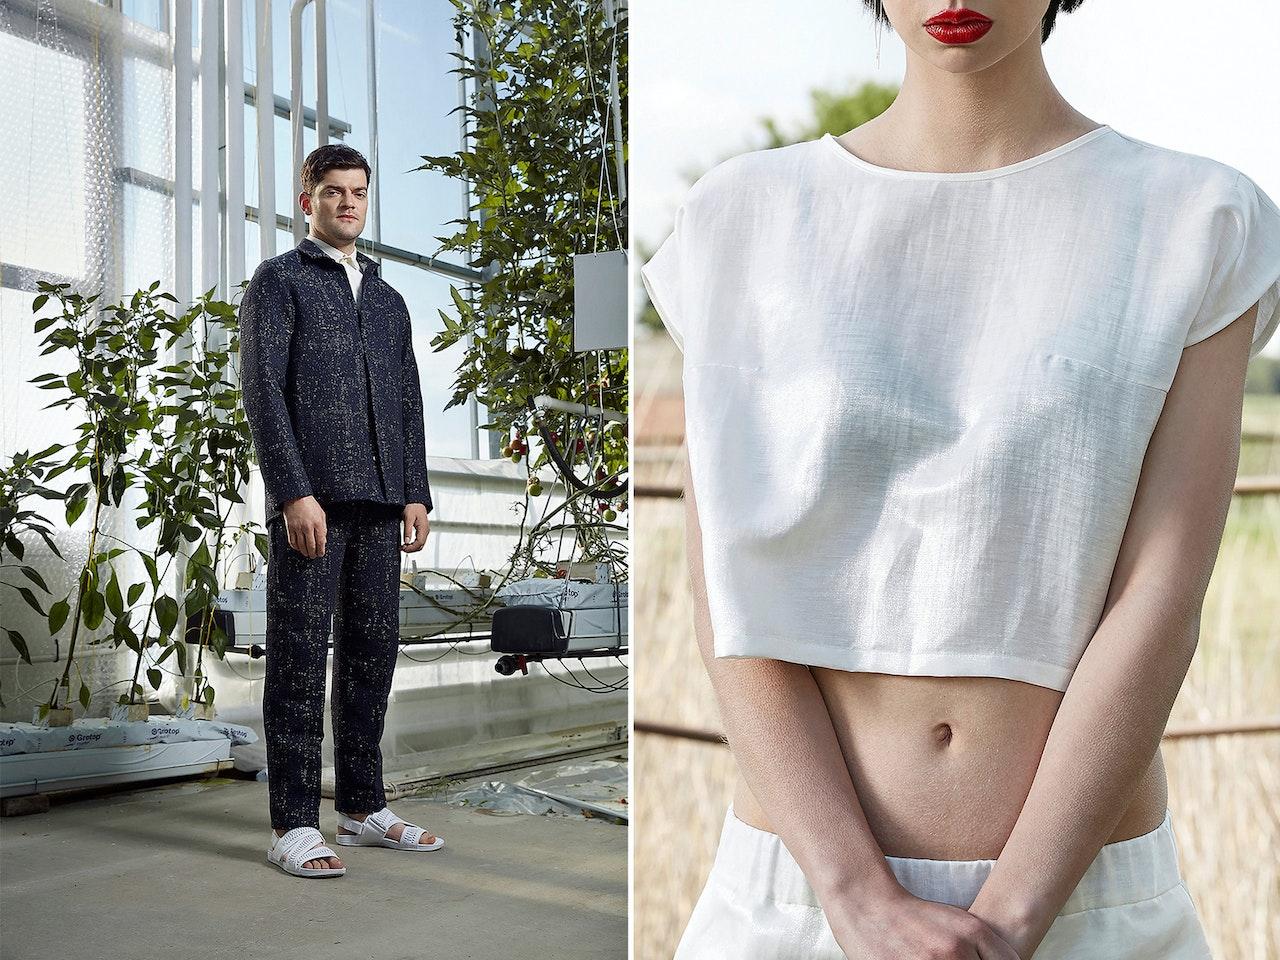 Fashion - Hannes Kettritz  /  Fashion Designer  /  Lookbook